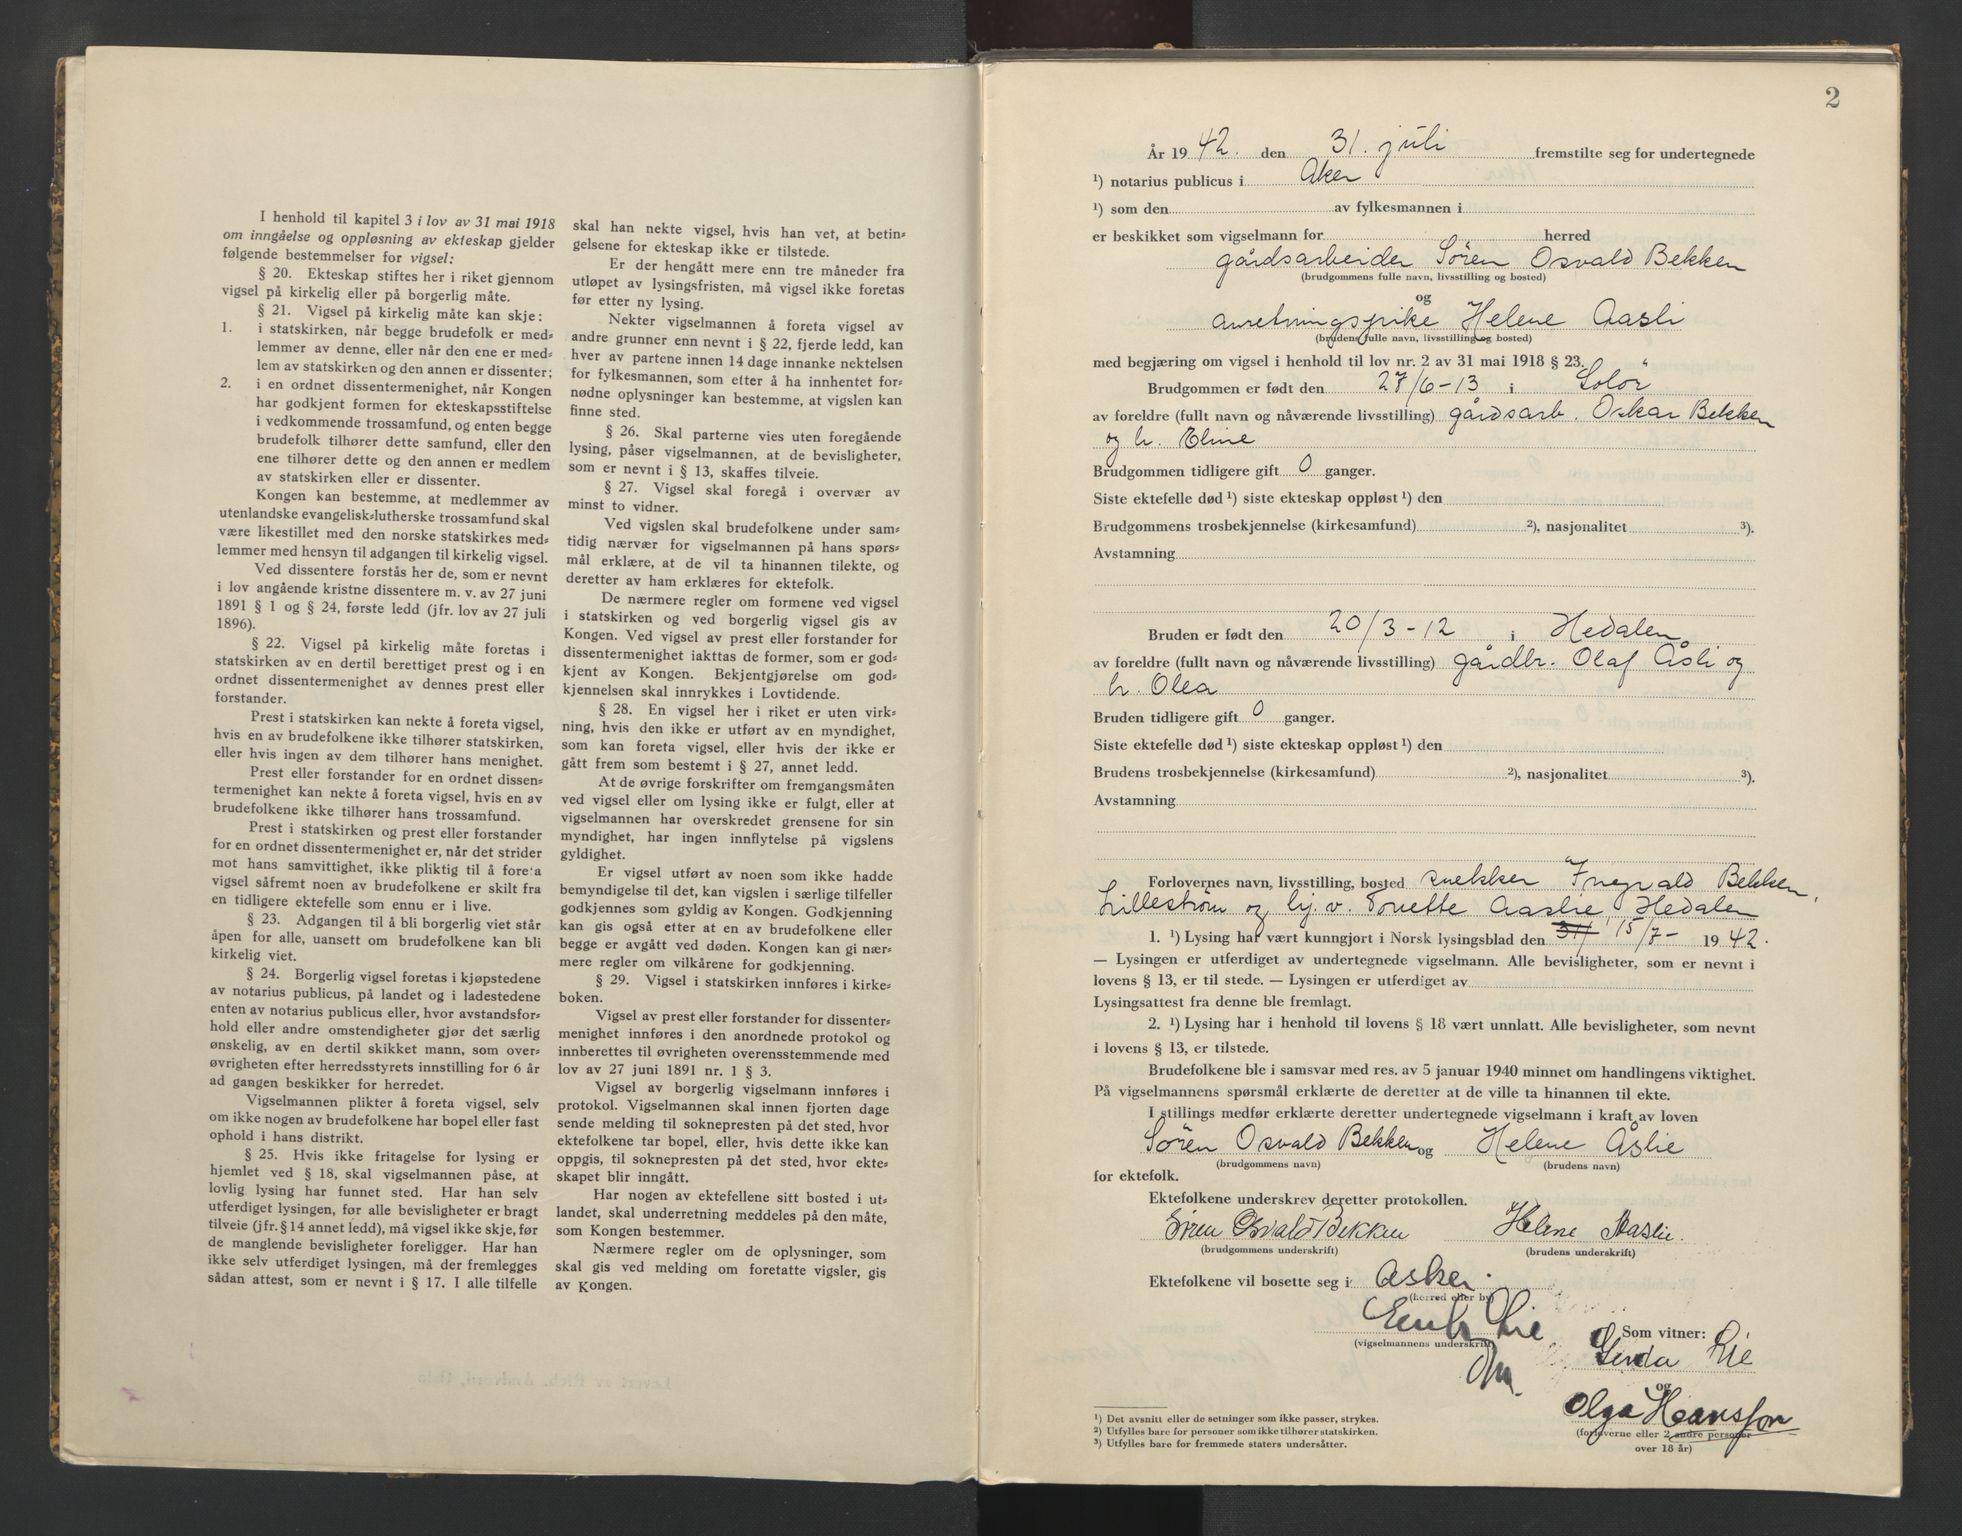 SAO, Aker sorenskriveri, L/Lc/Lcb/L0017: Vigselprotokoll, 1942, s. 2